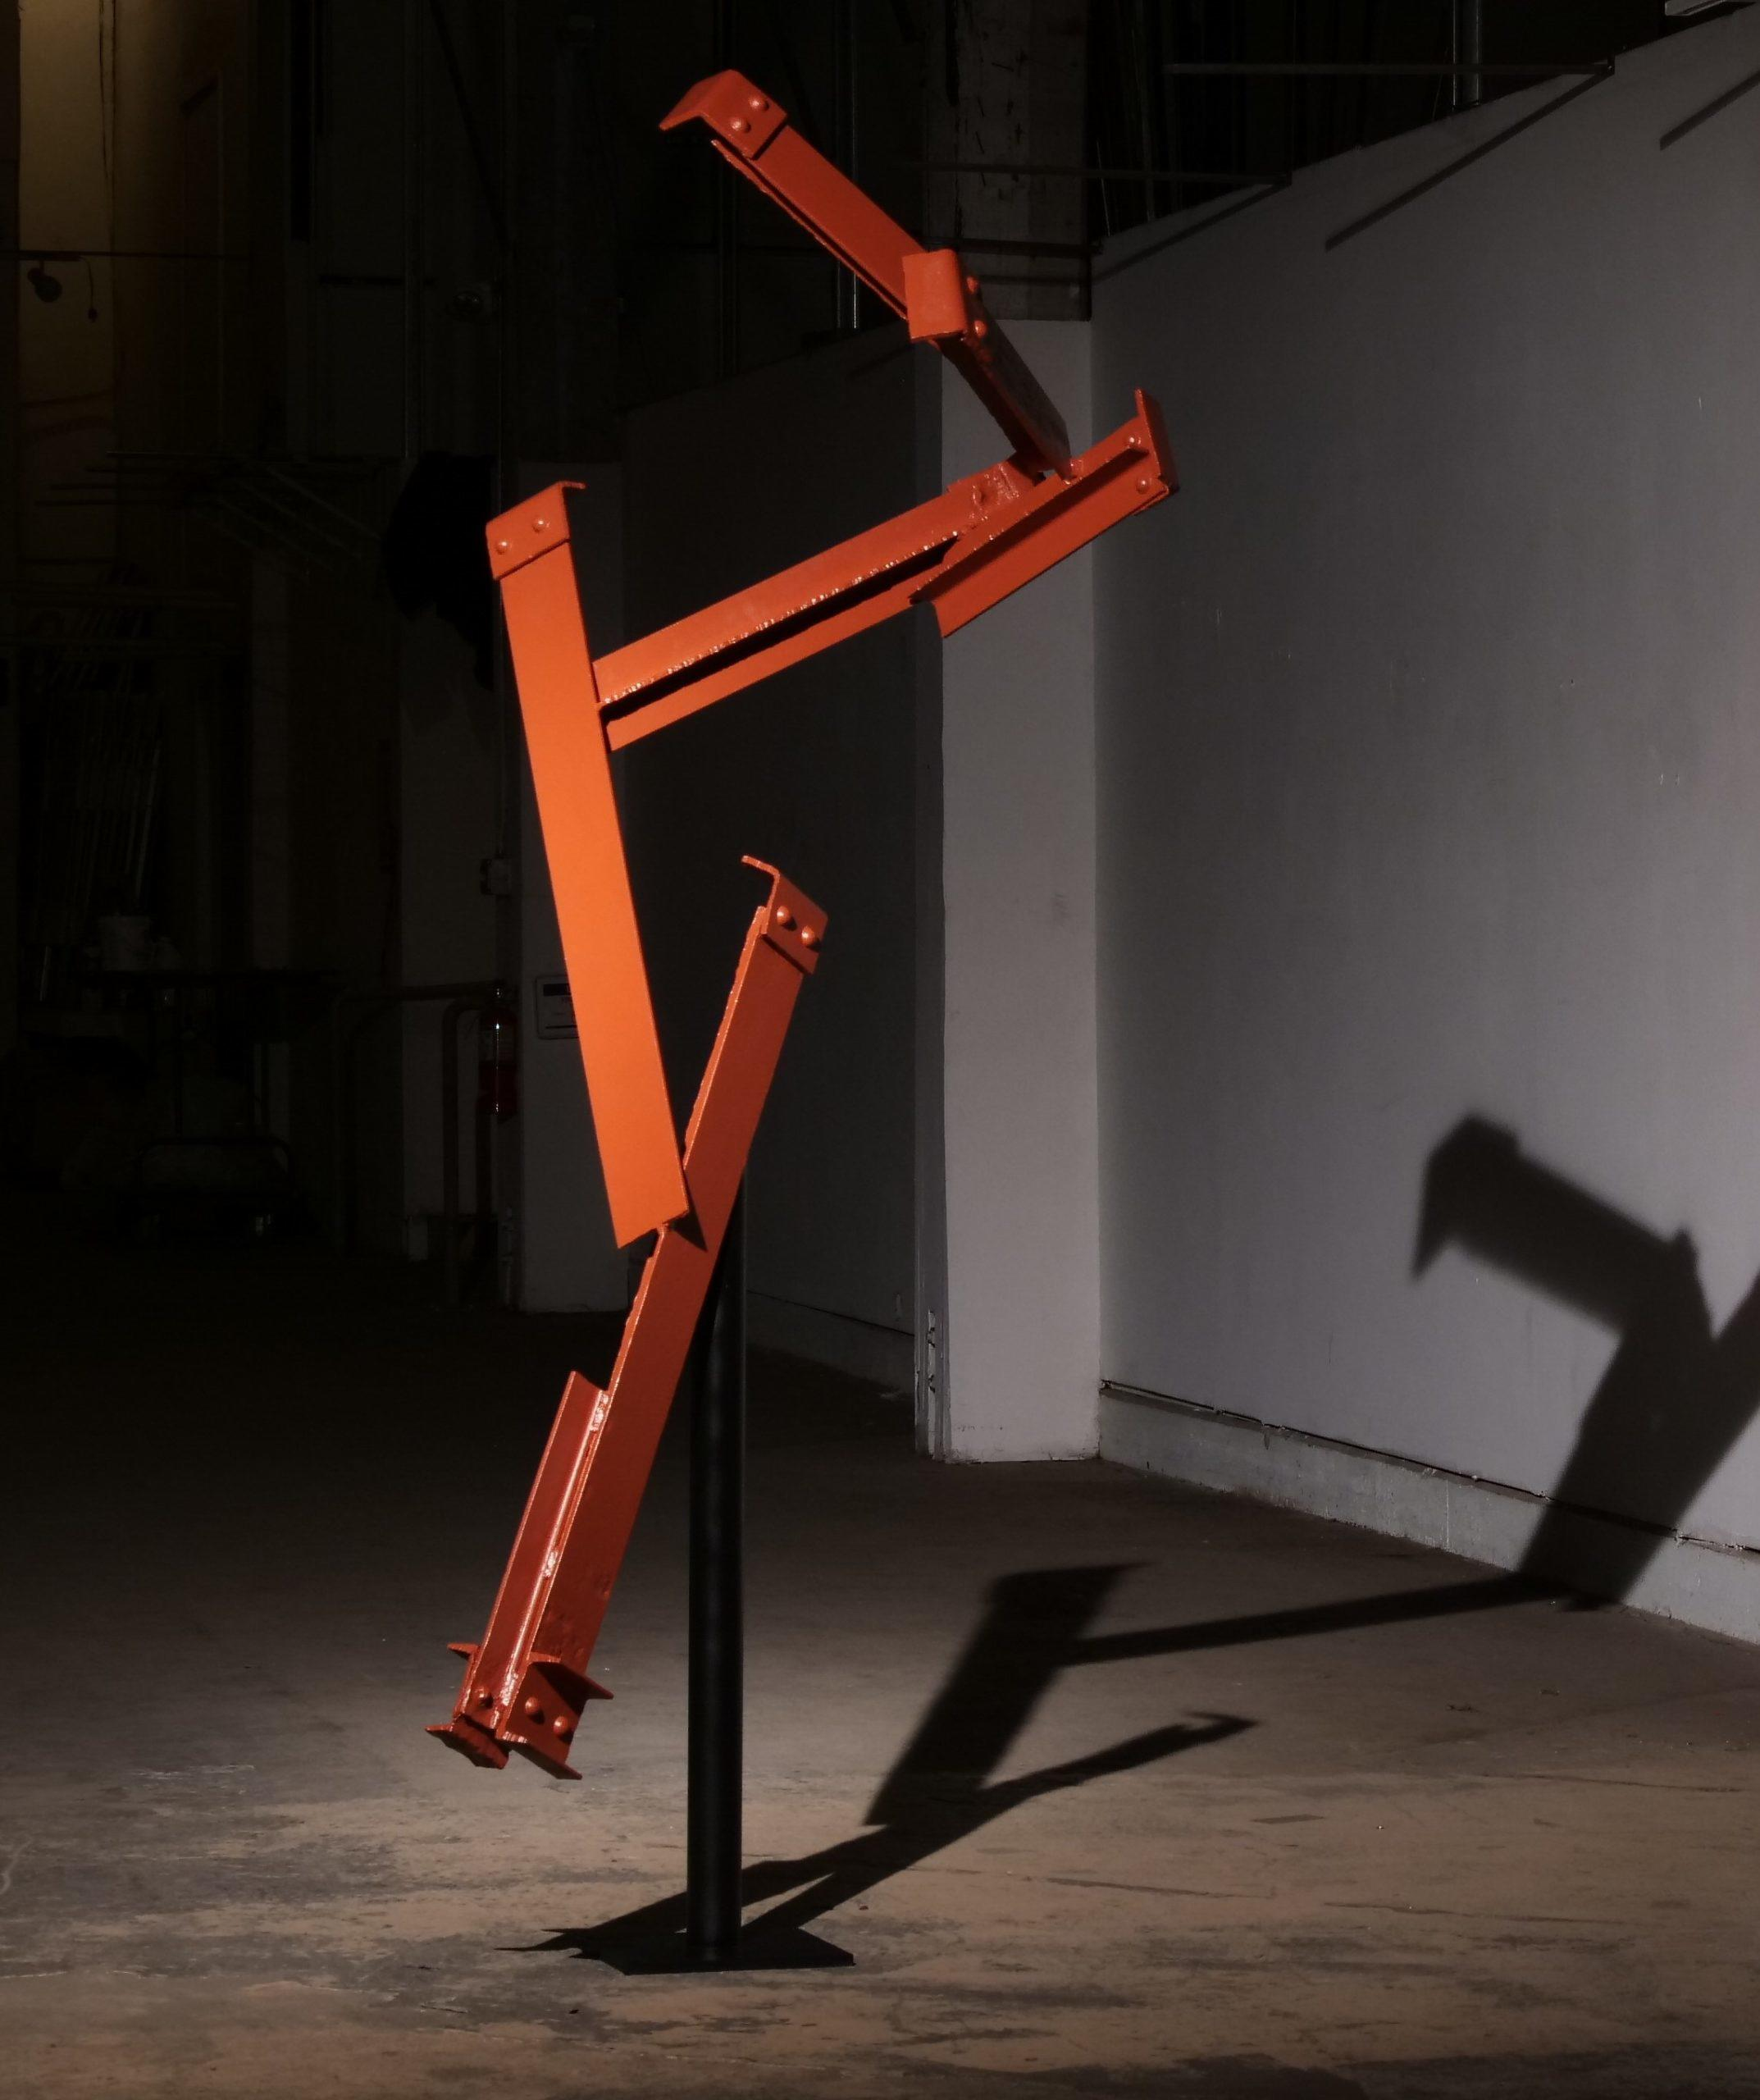 Golden Gate Bridge Steel - Kinetic Art Piece - Spinning Sculpture